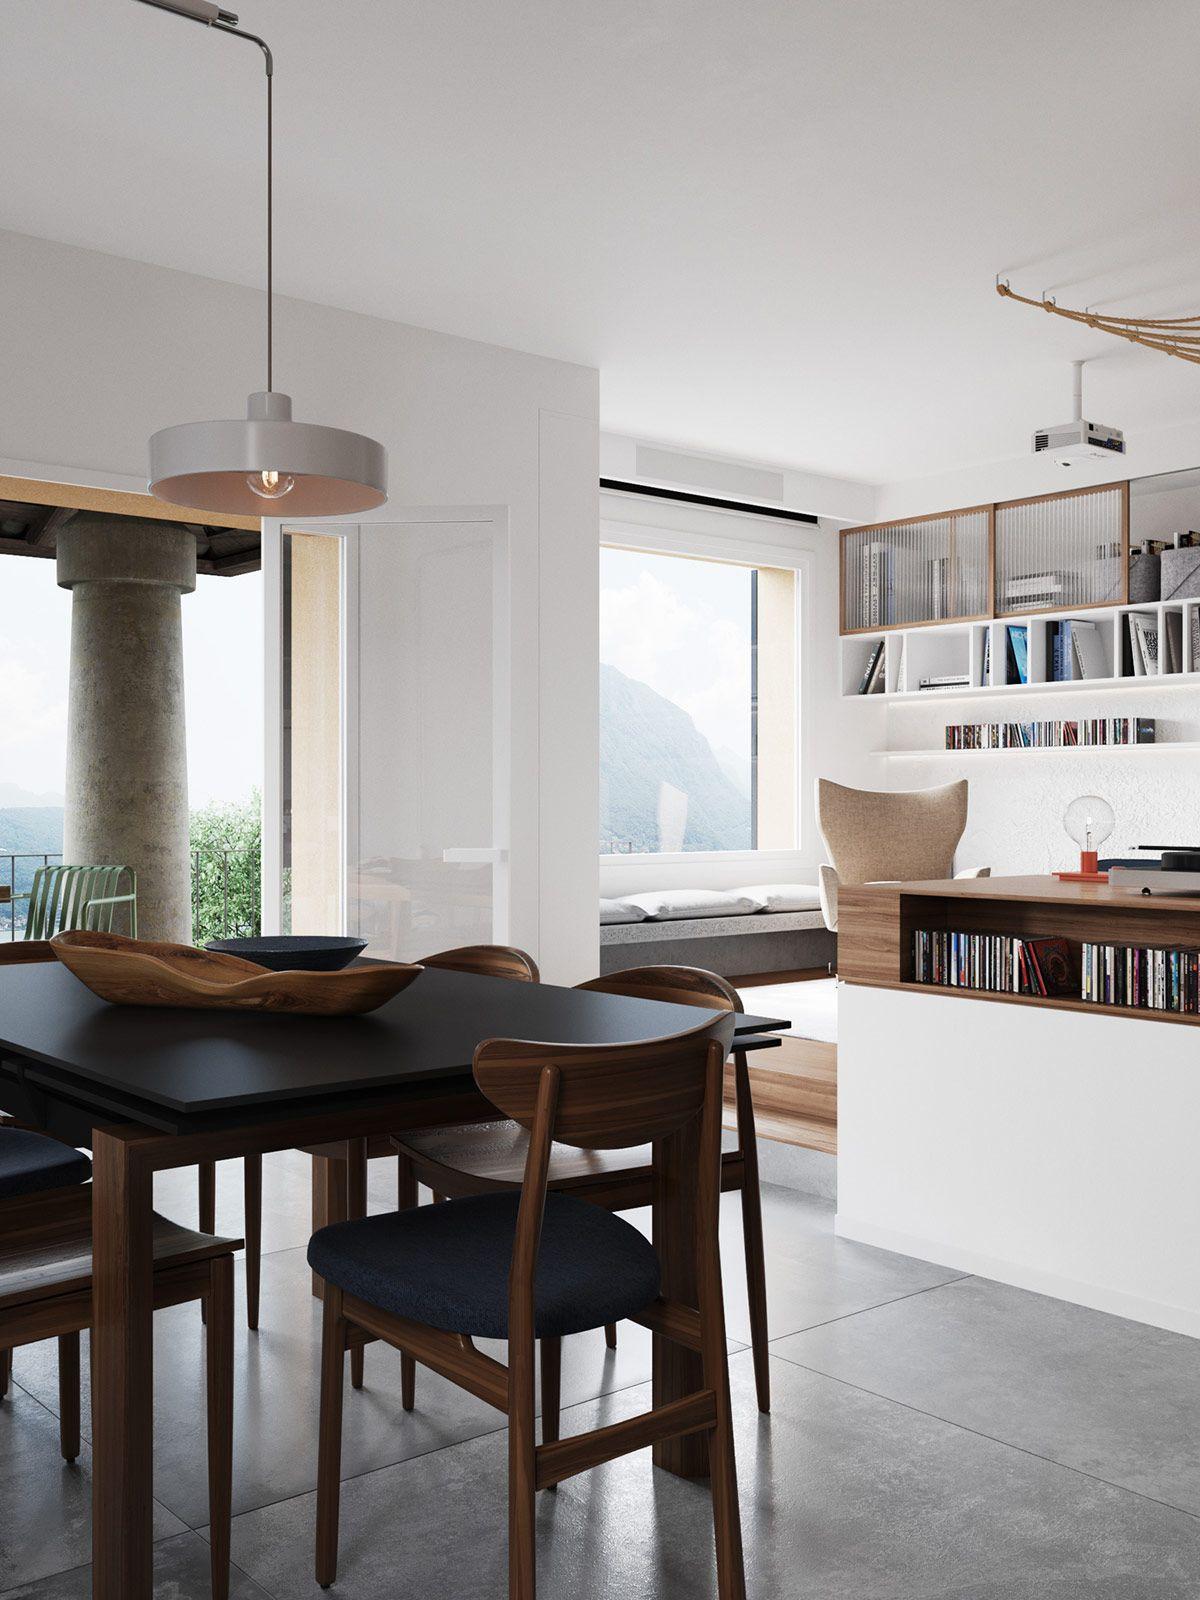 Beach House Minimalism Room interior design, Lake house